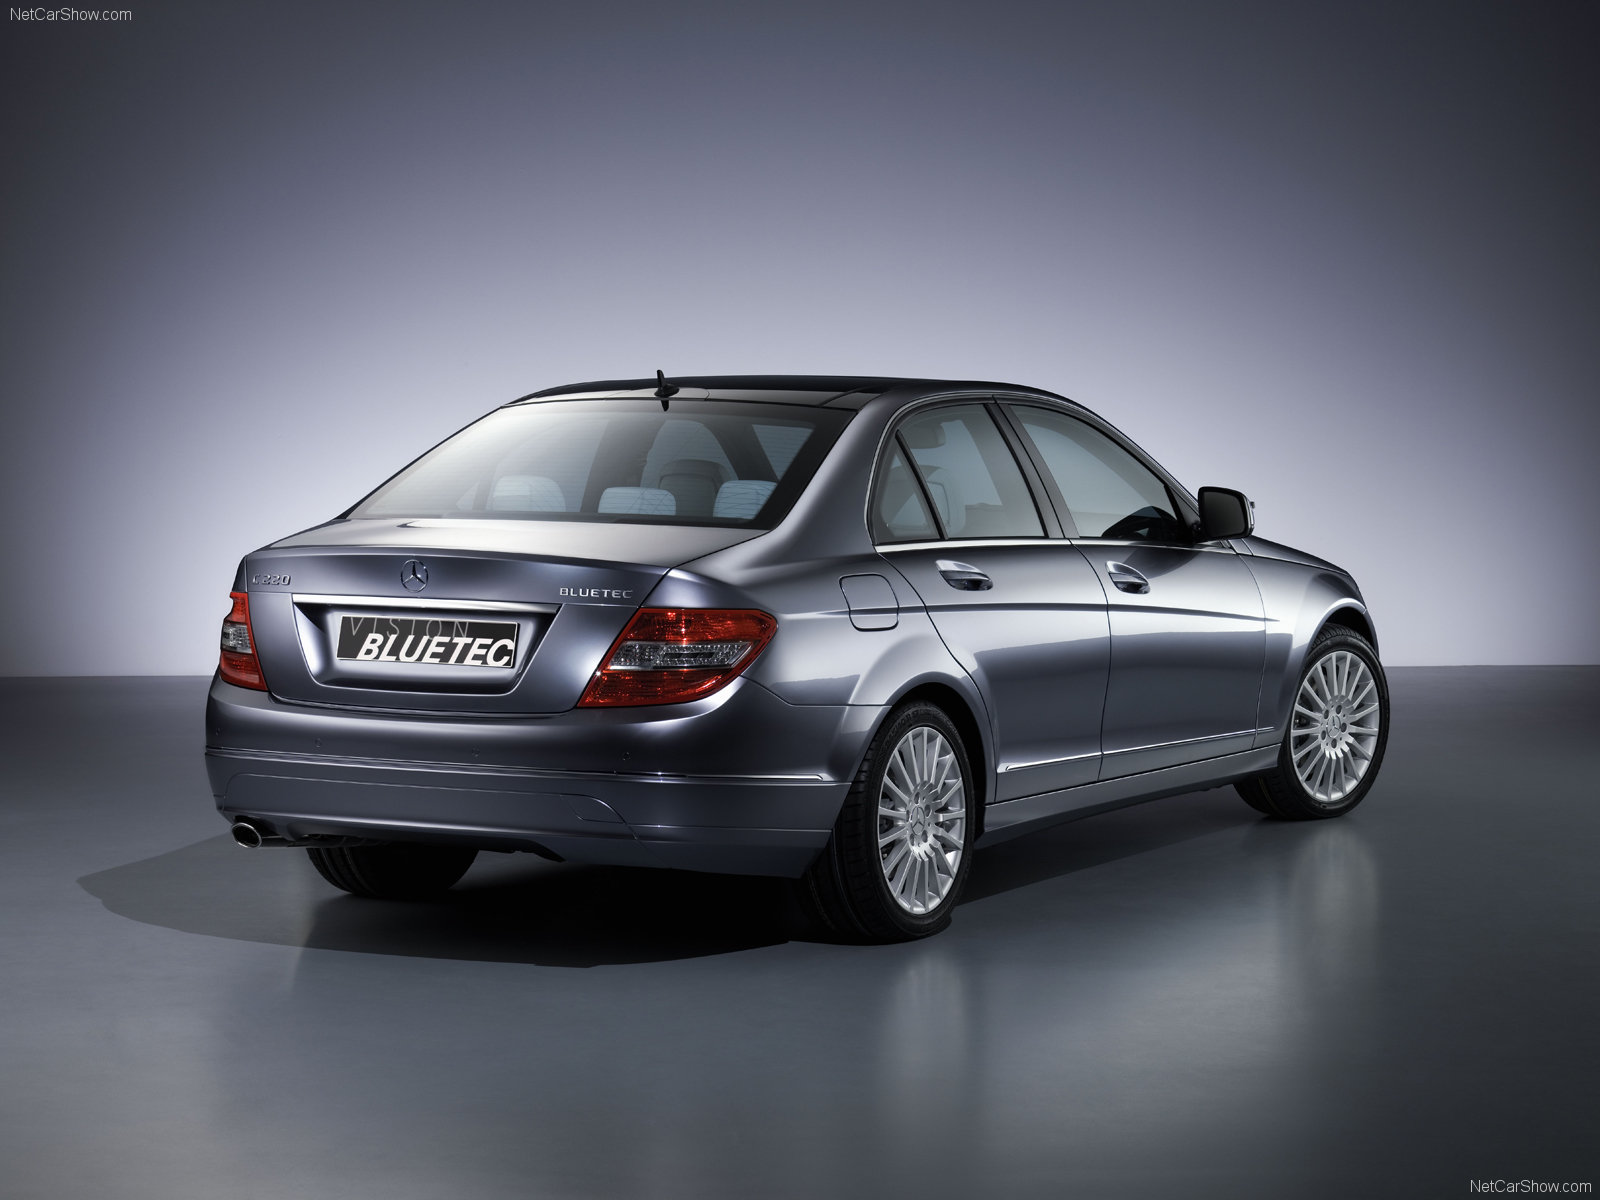 Mercedes benz vision c220 bluetec photos photogallery for Mercedes benz vision